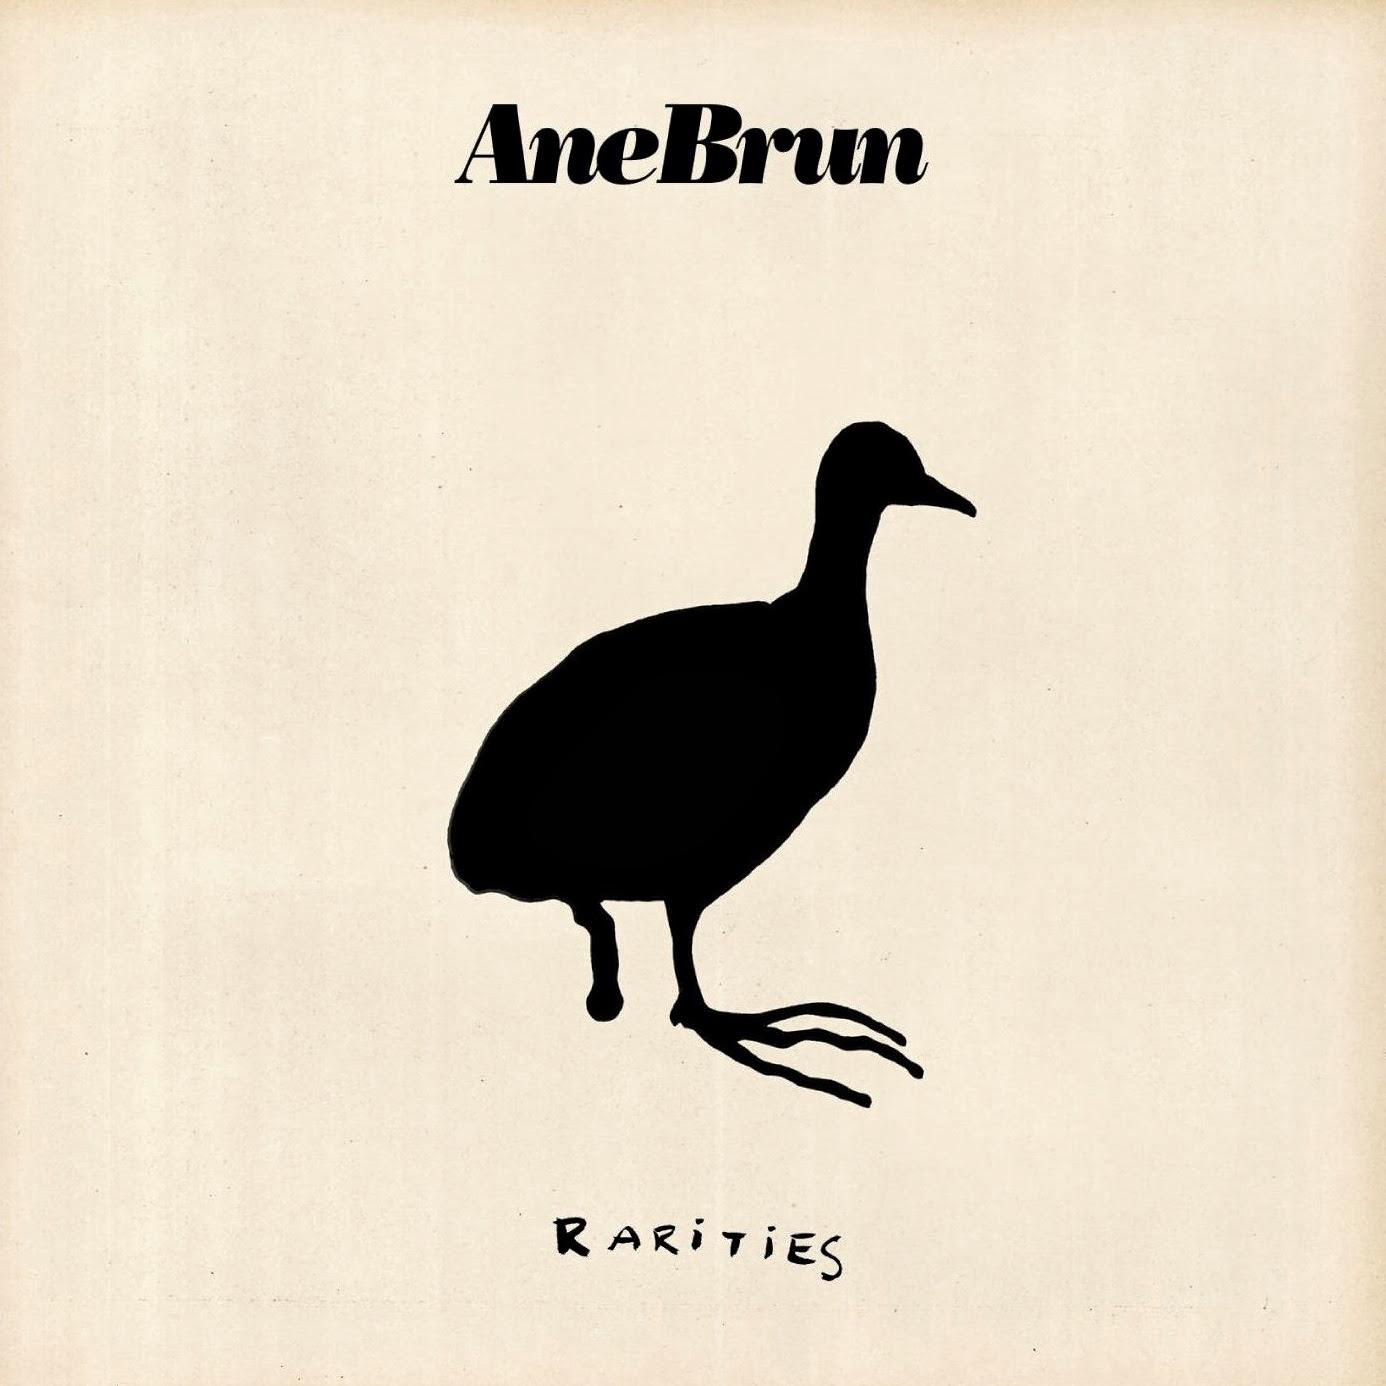 Ane Brun - Rarities [2xLP]